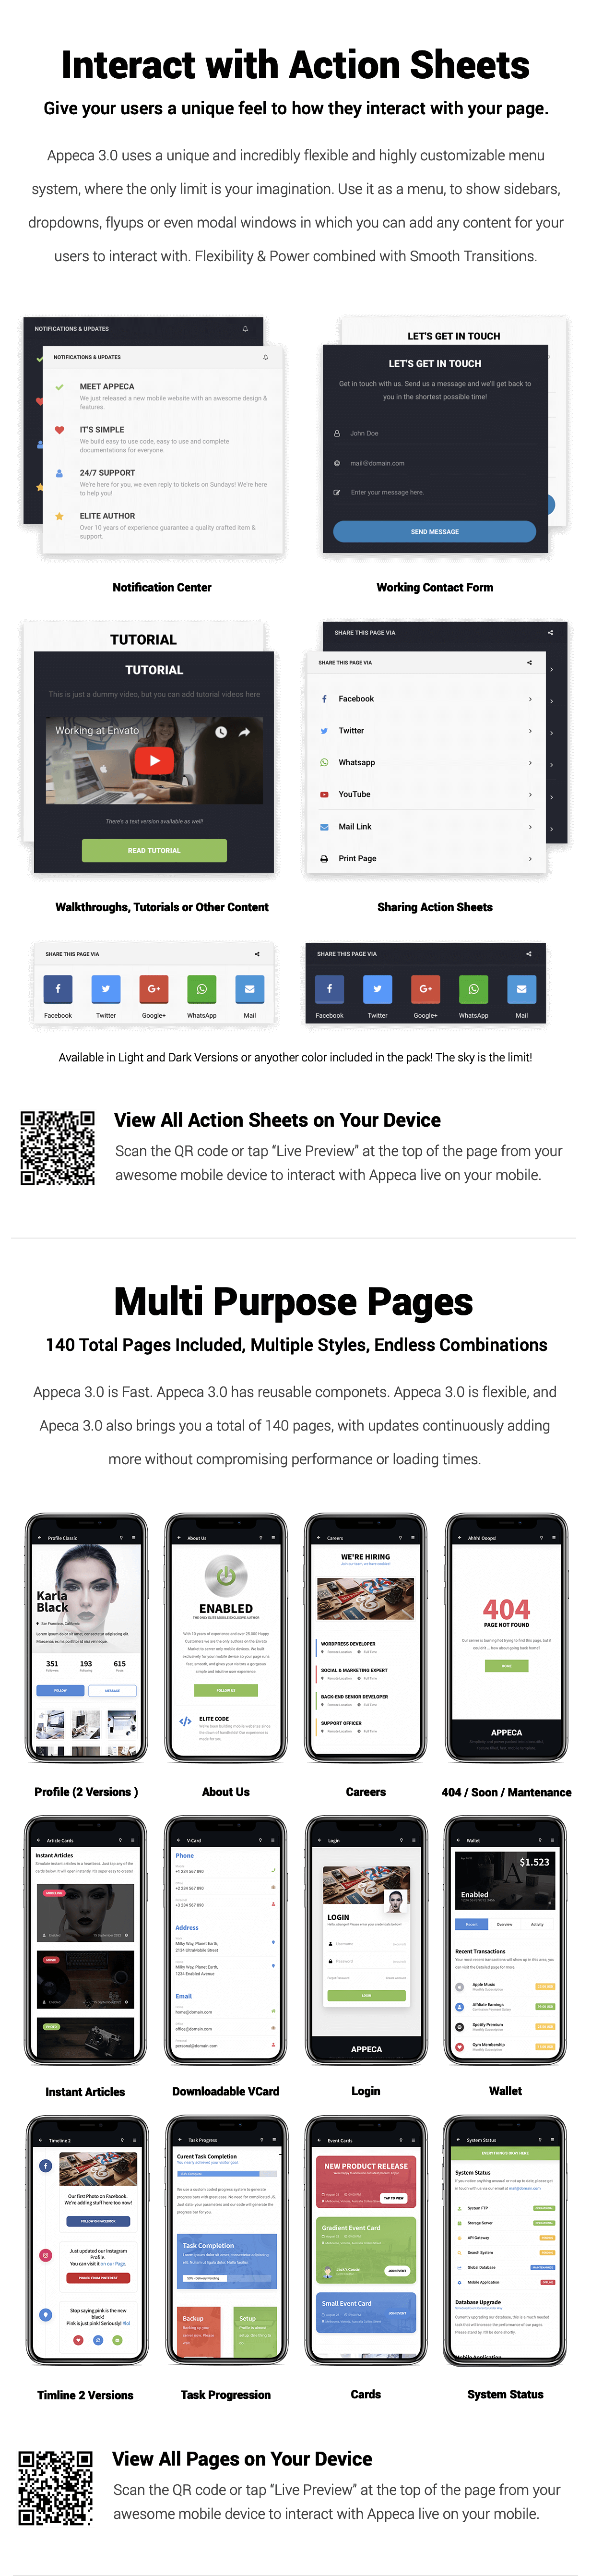 appeca 3b - Appeca Ultimate Mobile Template